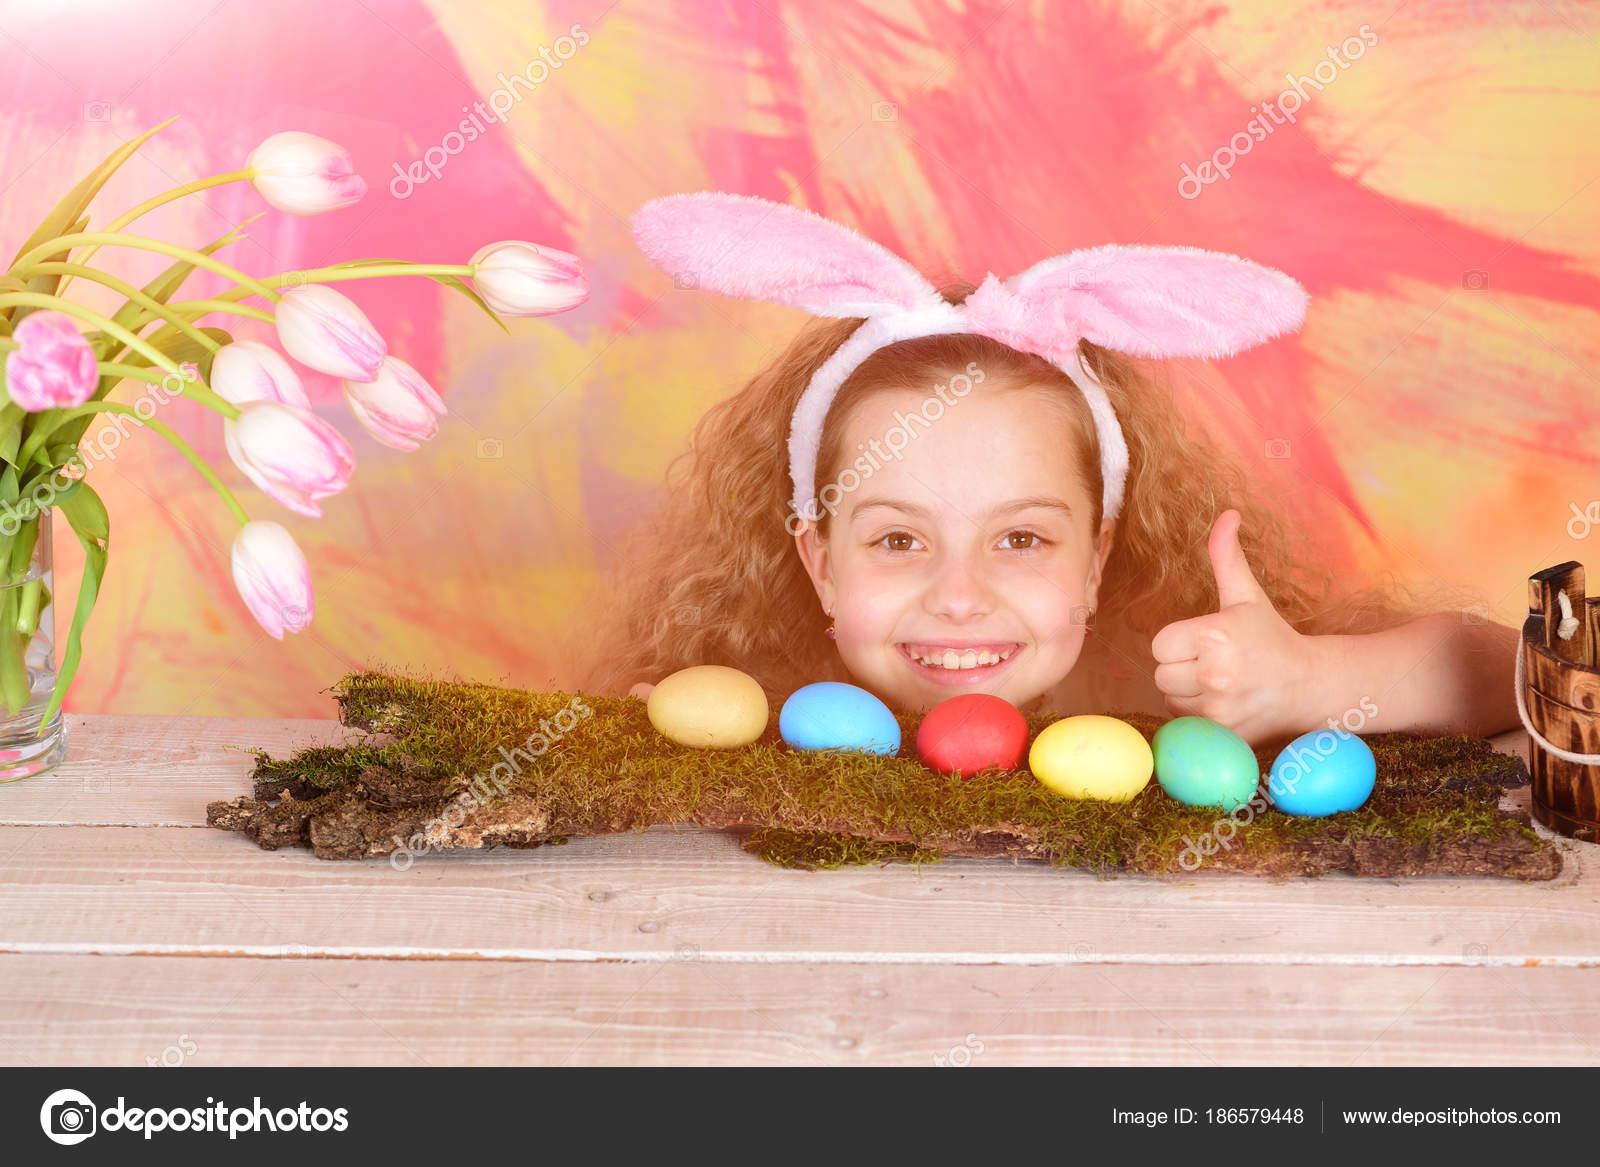 3ec040c045b Hapyy αυγά τις διακοπές του Πάσχα και λαγουδάκι συναισθήματα και  συγκινήσεις, ευτυχισμένος κορίτσι Πάσχα στα αυτιά λαγουδάκι, μικρό παιδί με  σγουρά μαλλιά ...